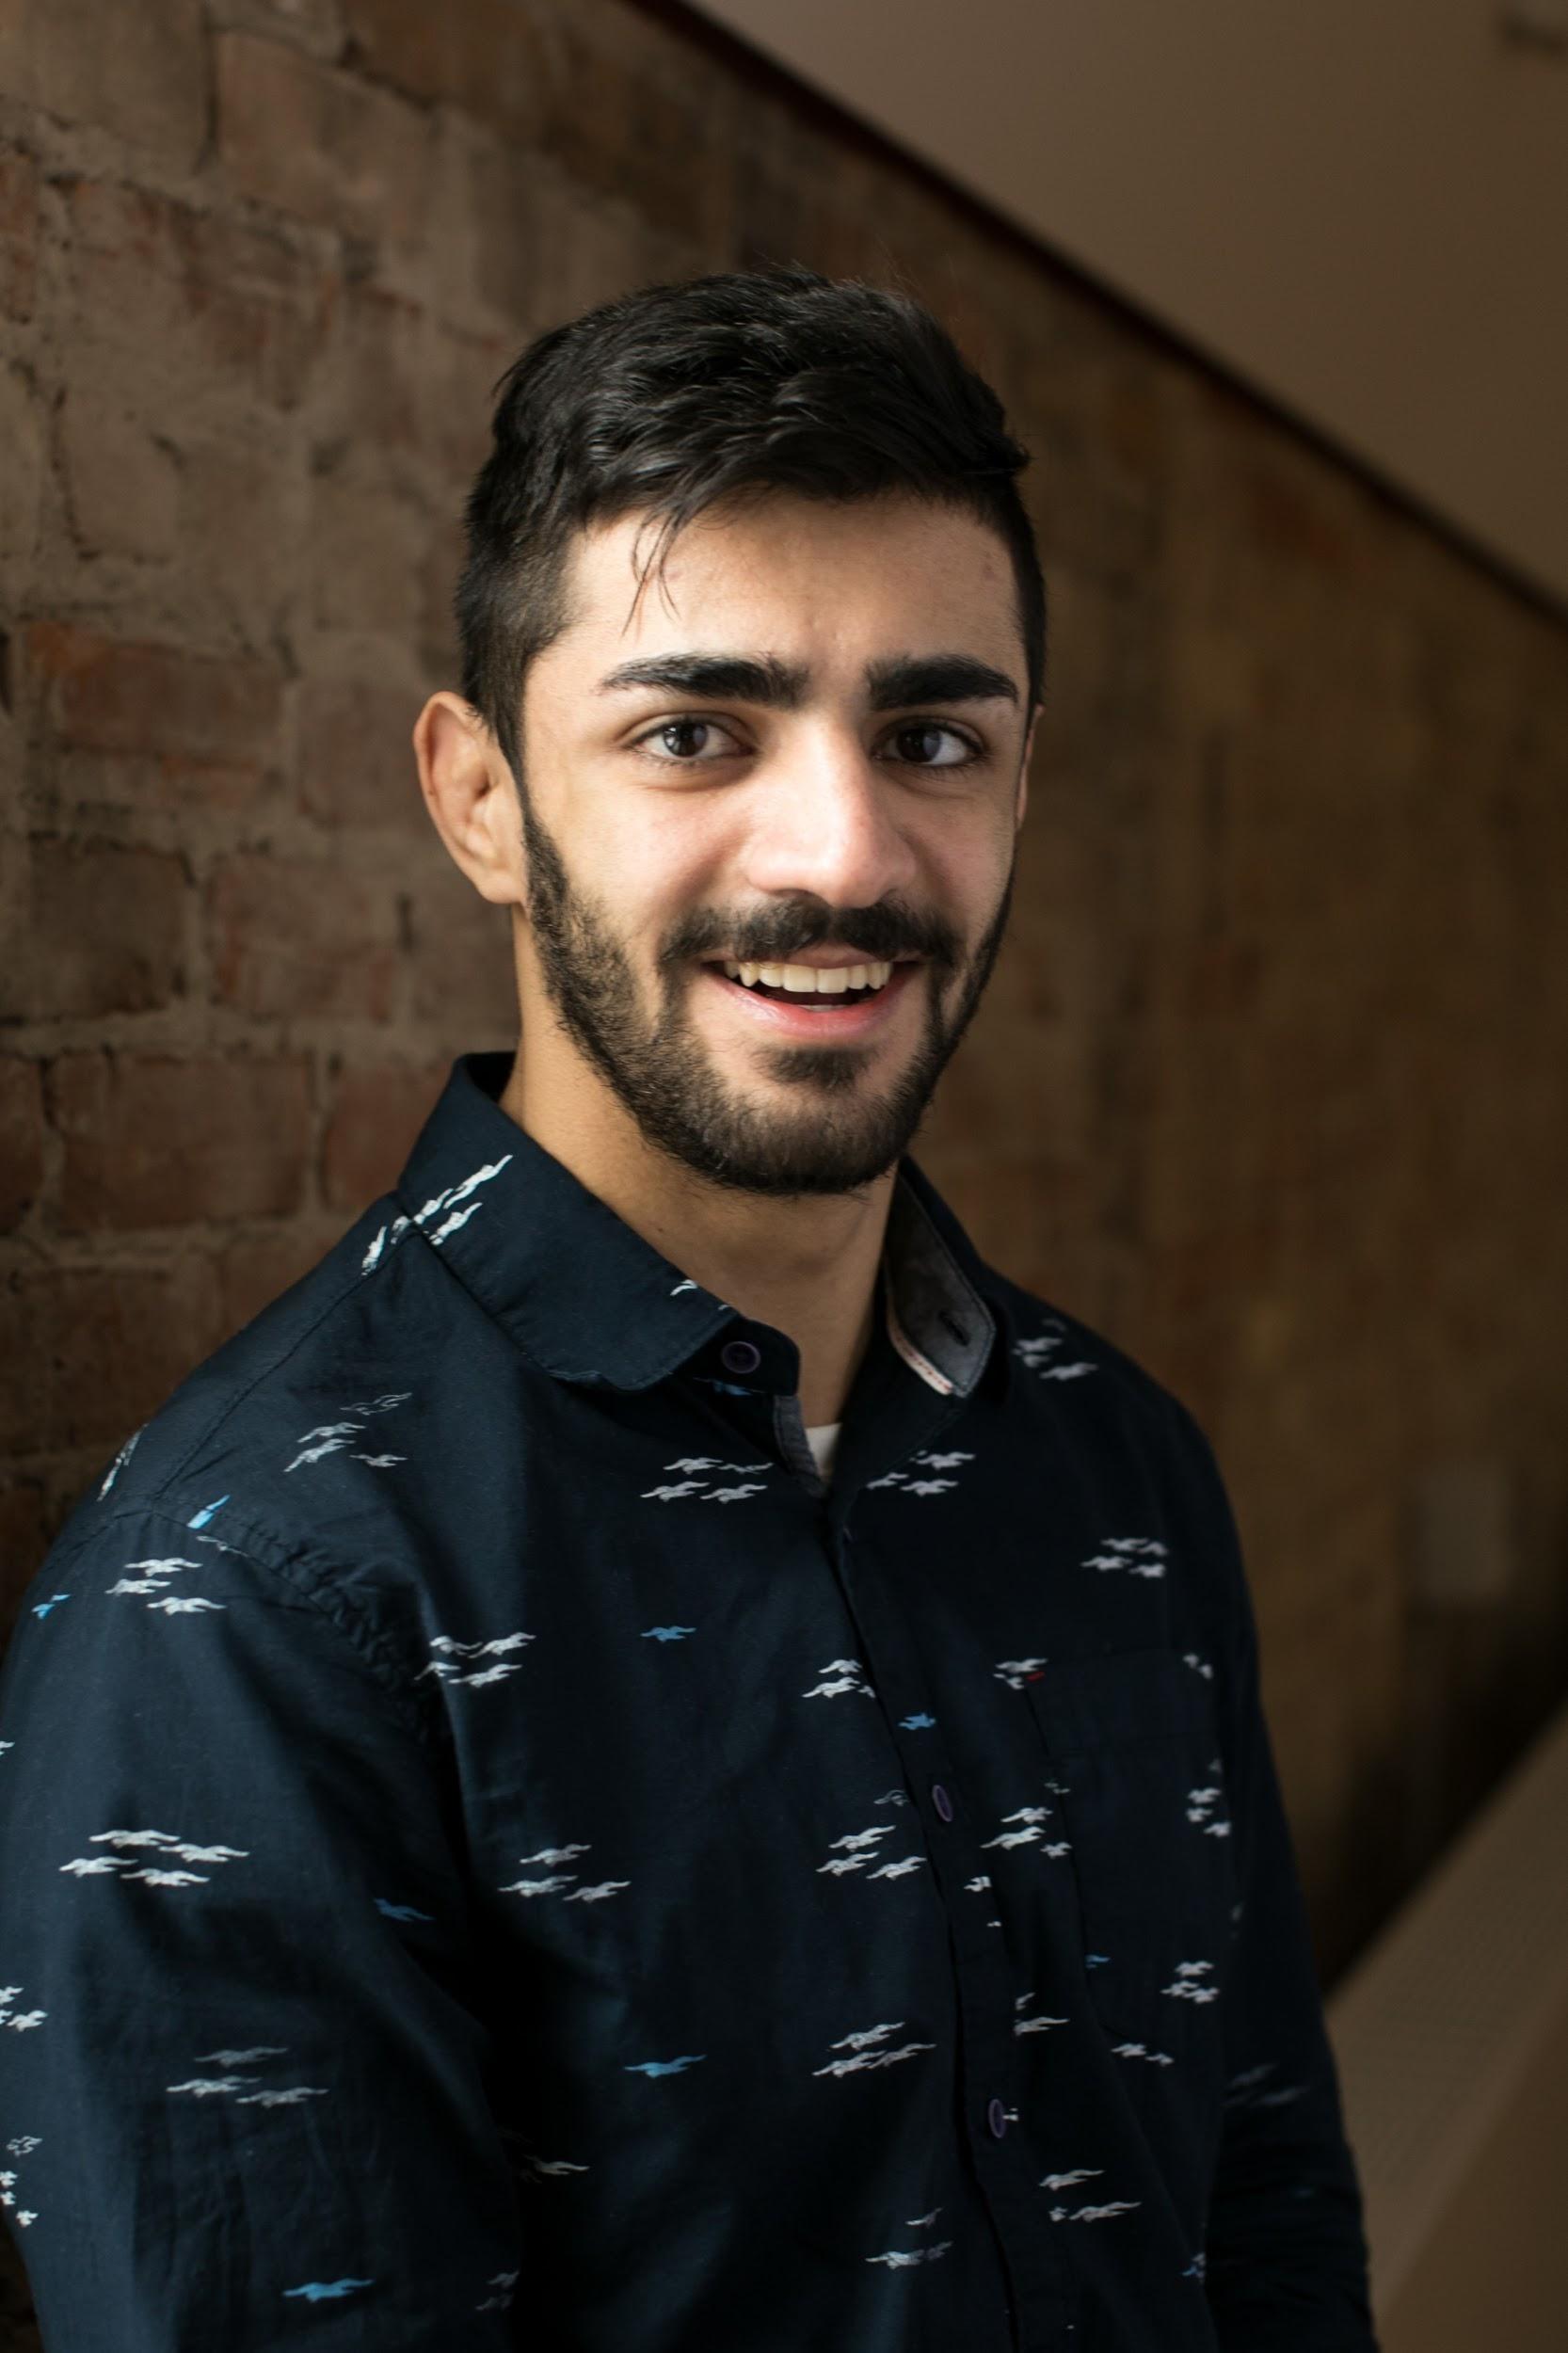 WB Student Reza F, 2T2